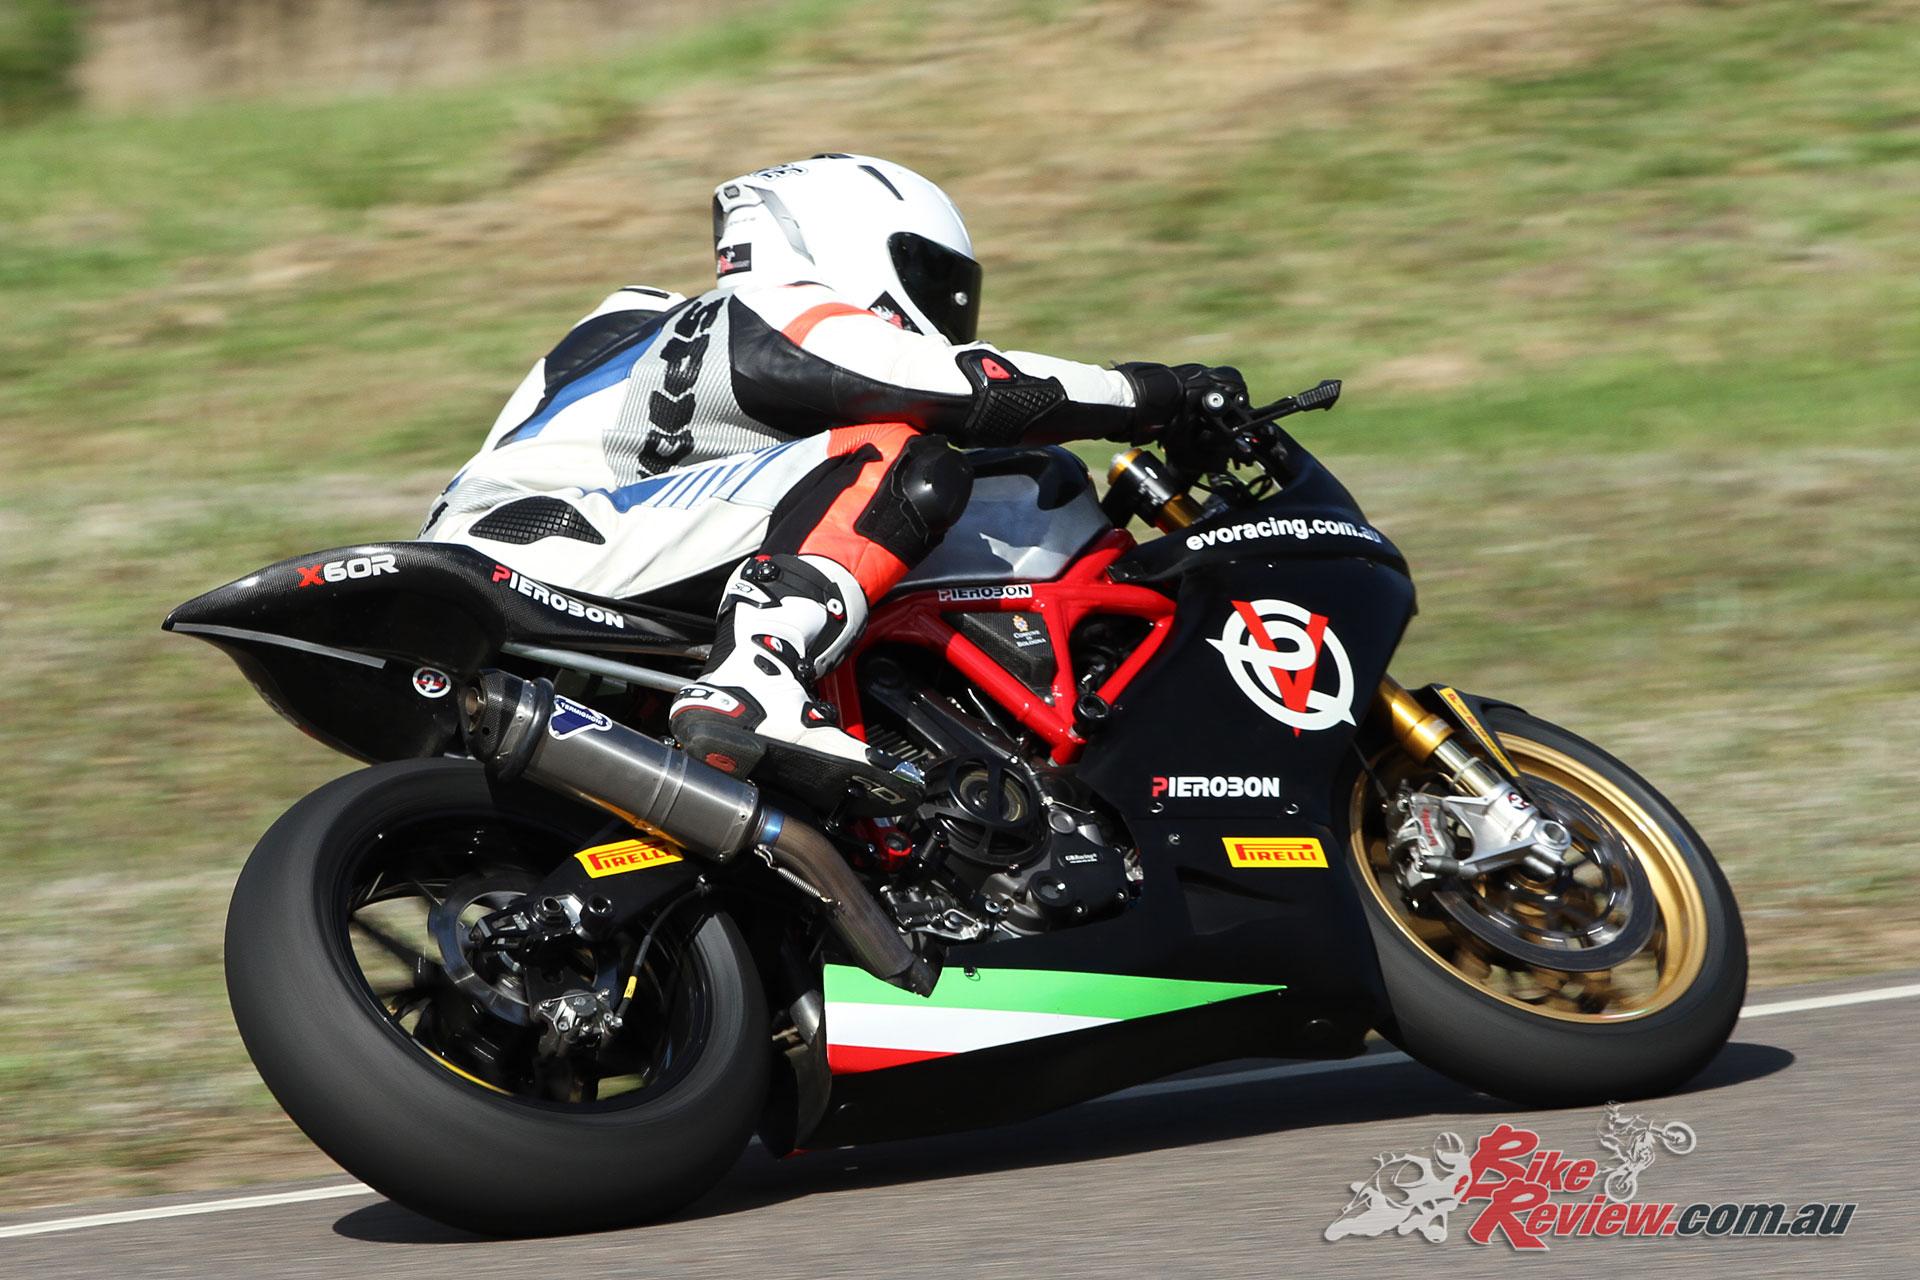 EVO-Racing-Pierobon-Ducati-X60R-Racer-4334